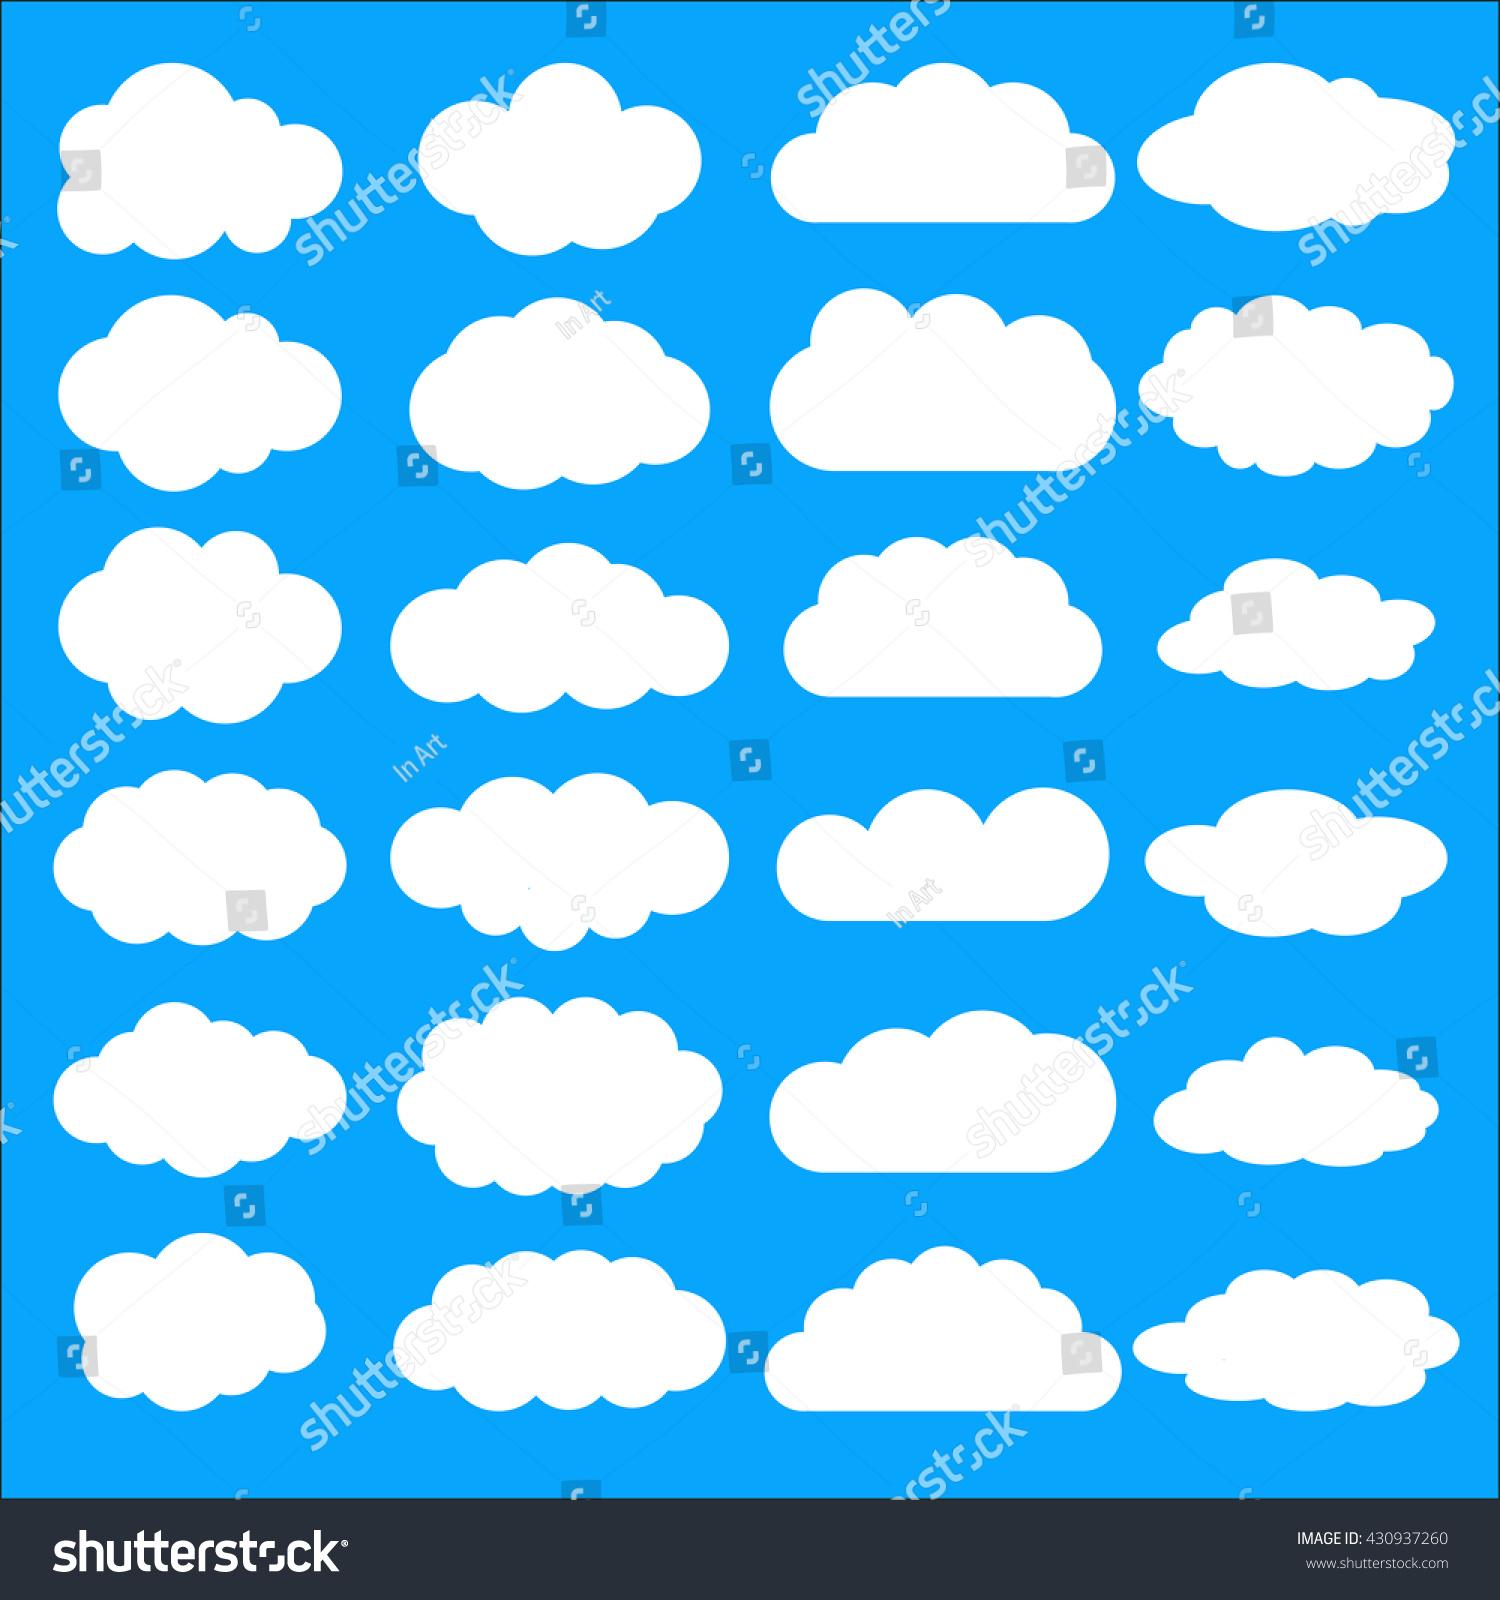 photograph regarding Printable Clouds Cut Out named Clouds Cutouts Printables status